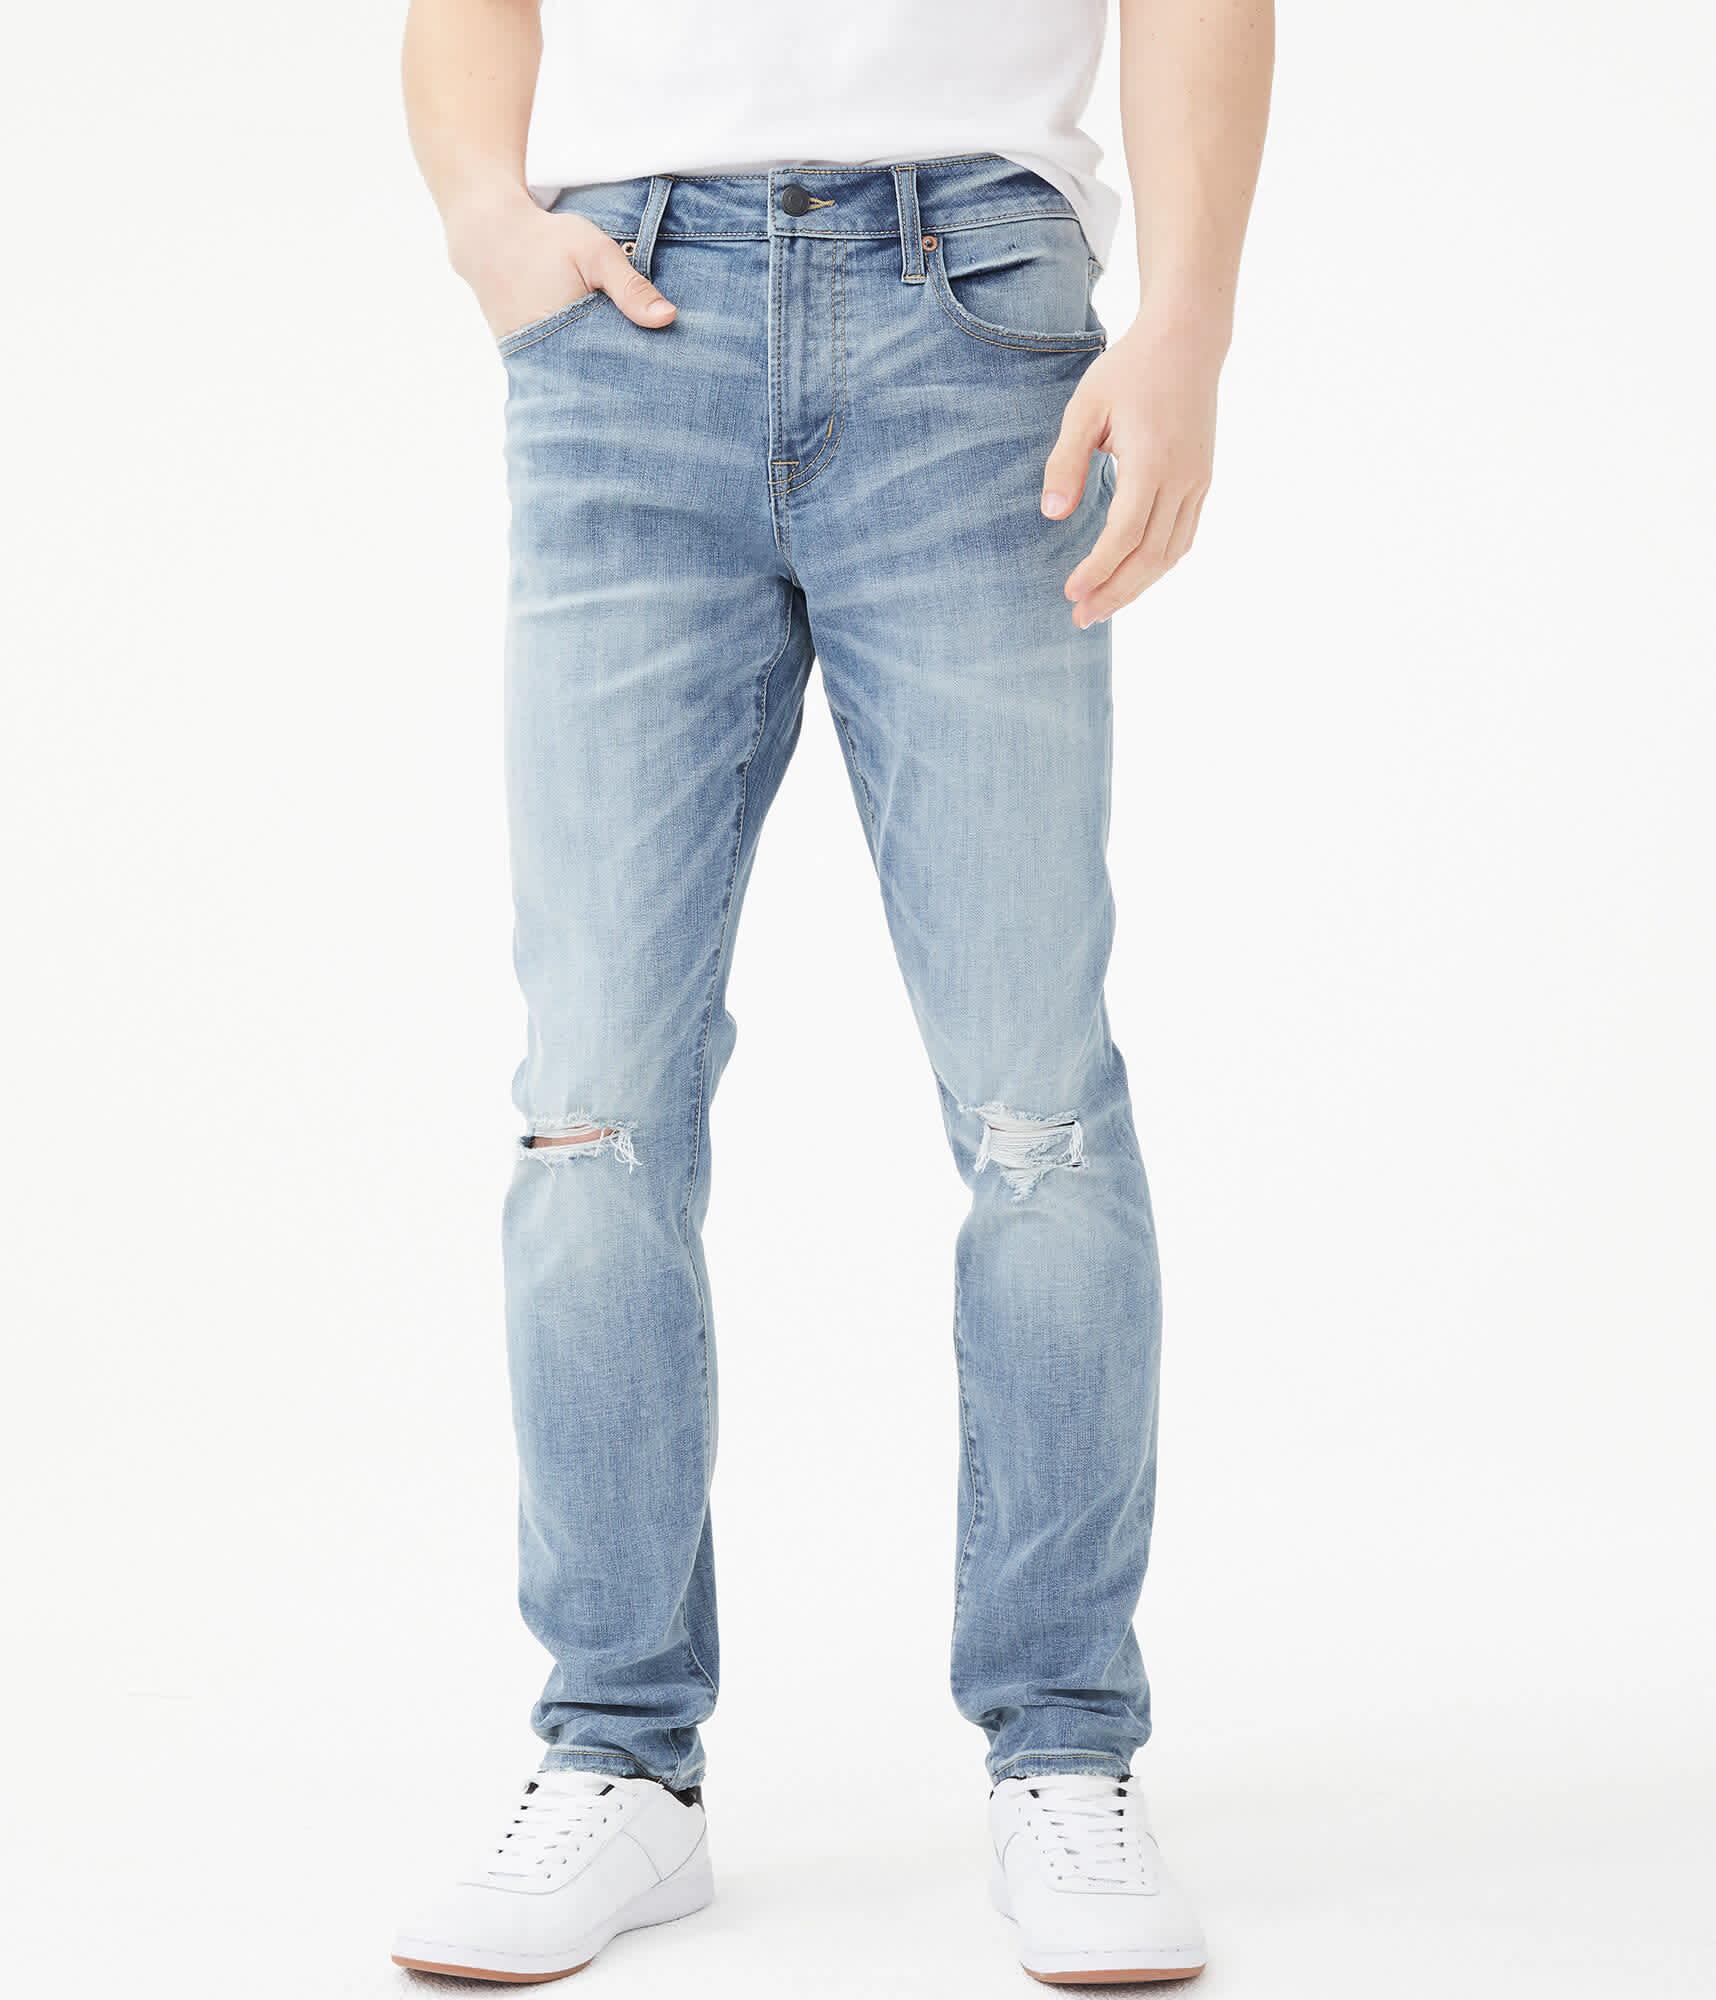 Aeropostale Men's Premium Max Stretch Super Skinny Jeans